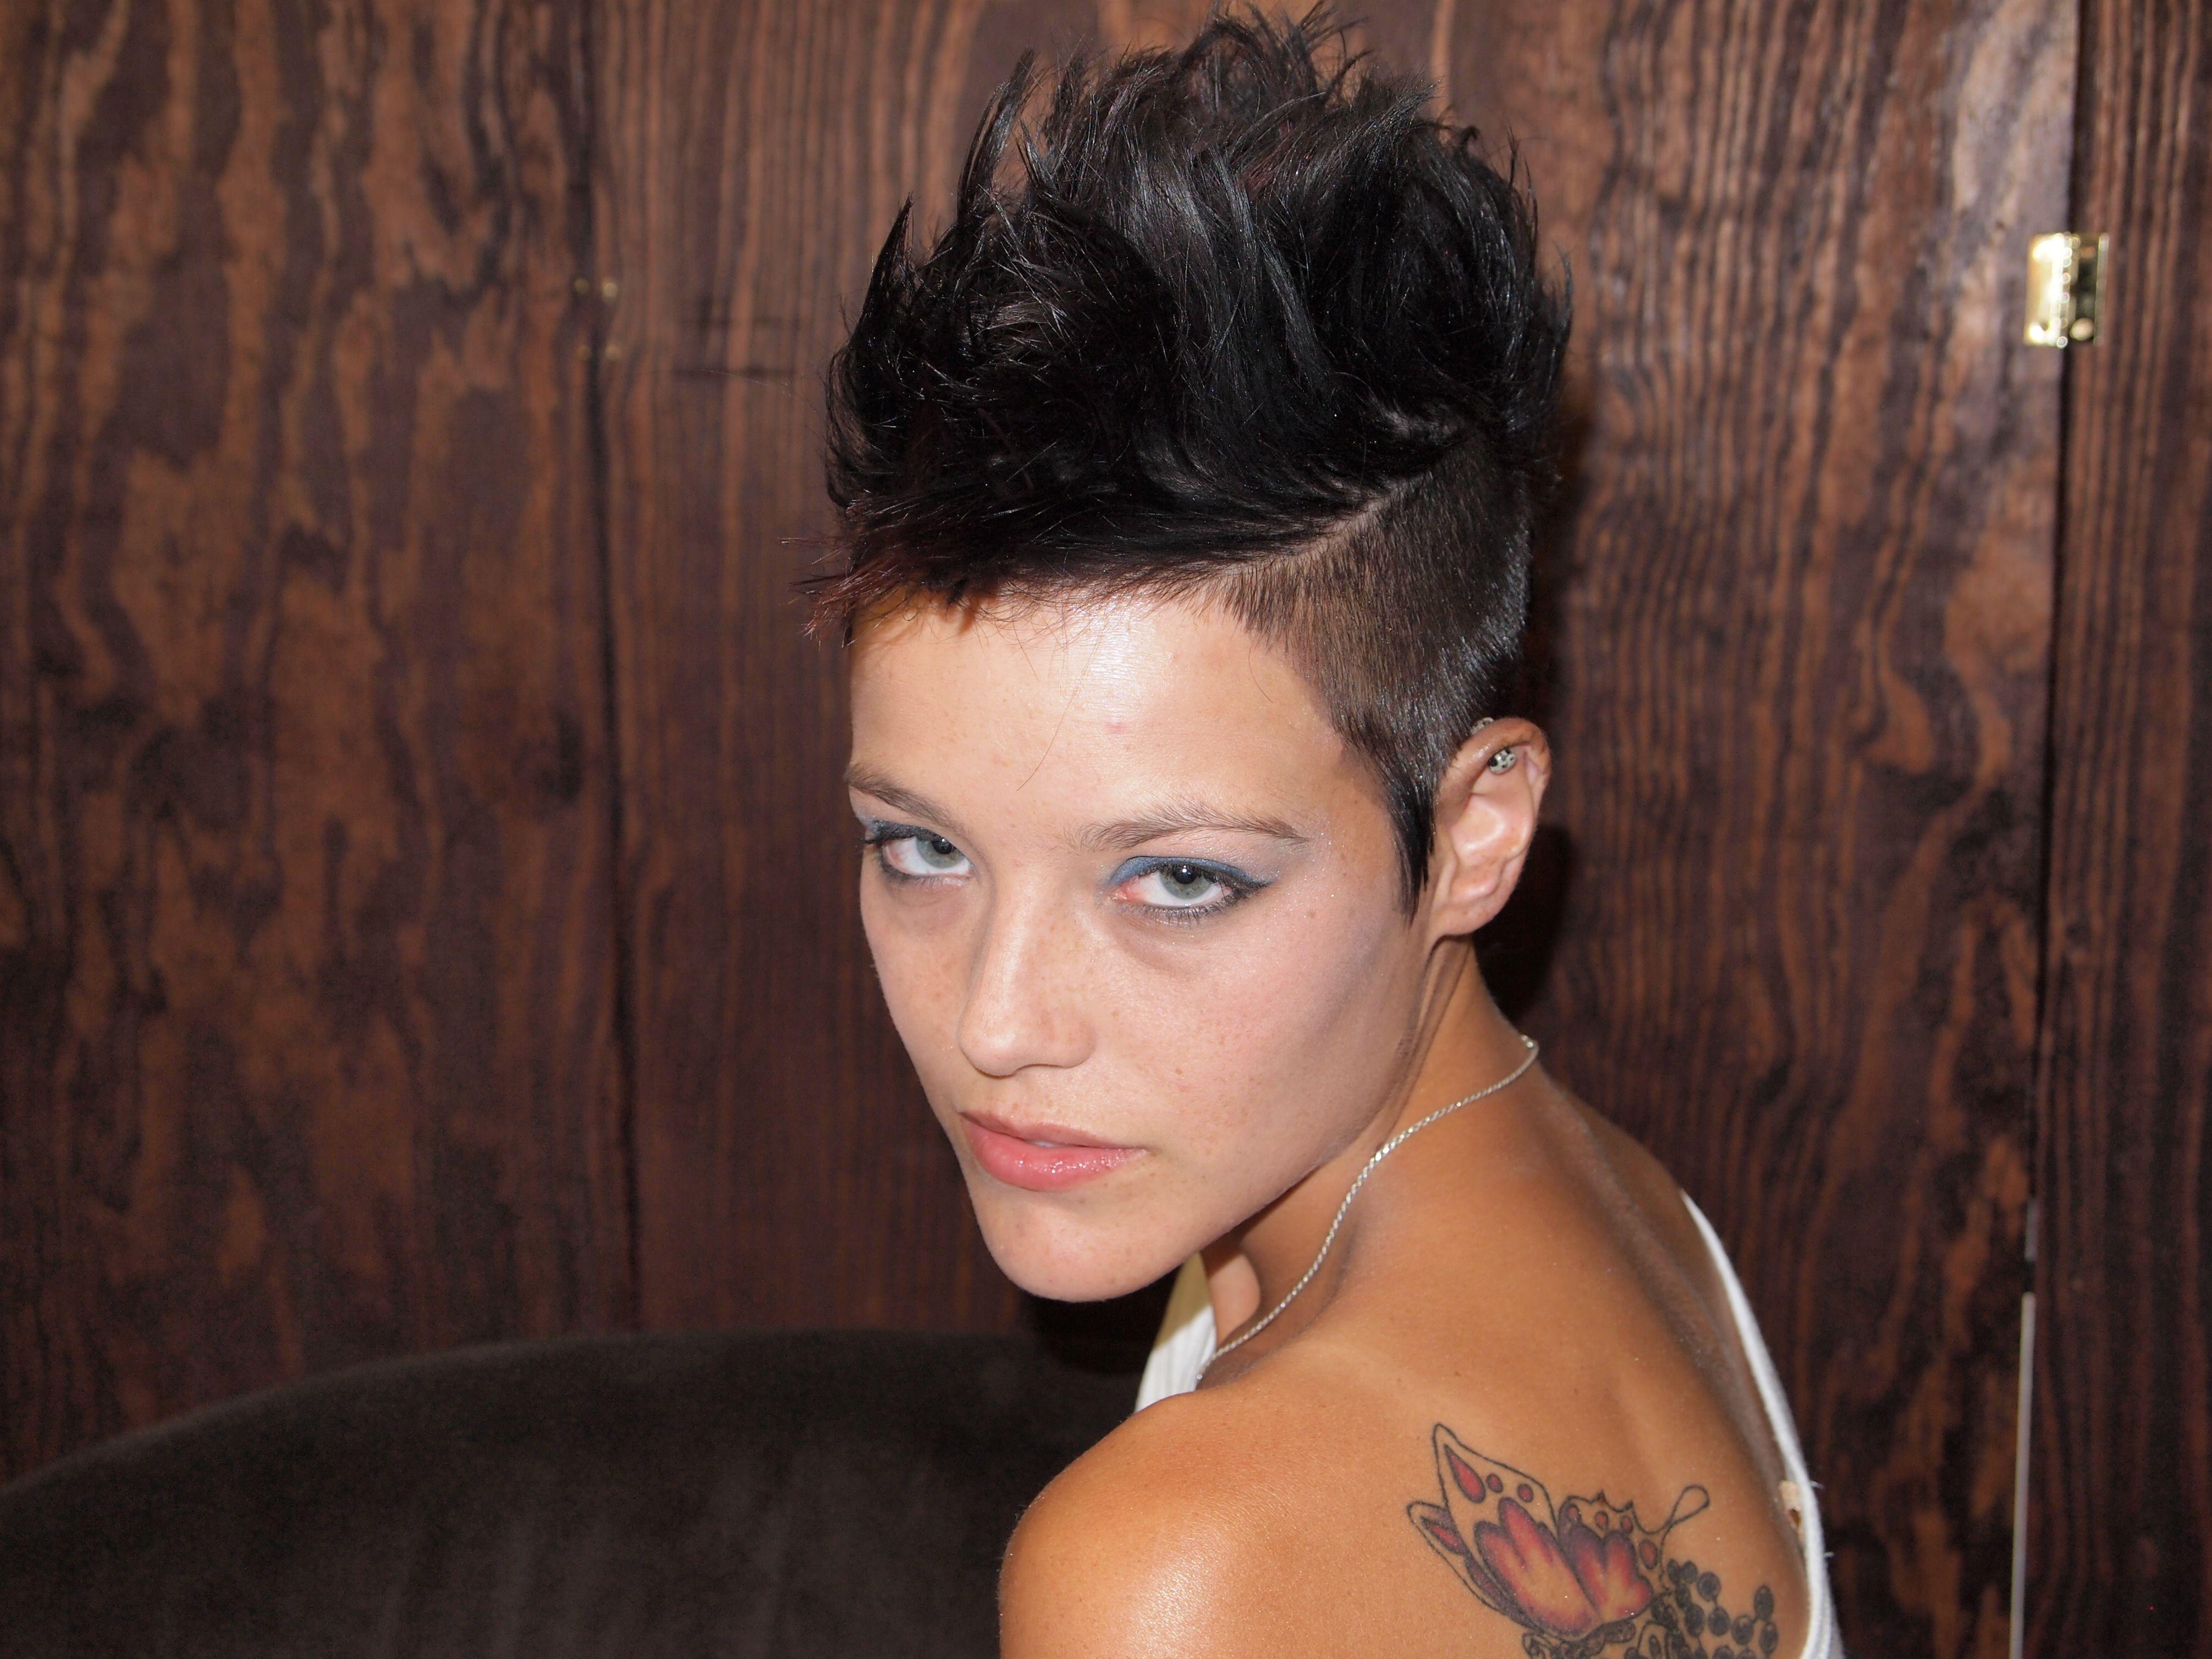 Mohawk girl mohawk for the woman pinterest hair hair styles